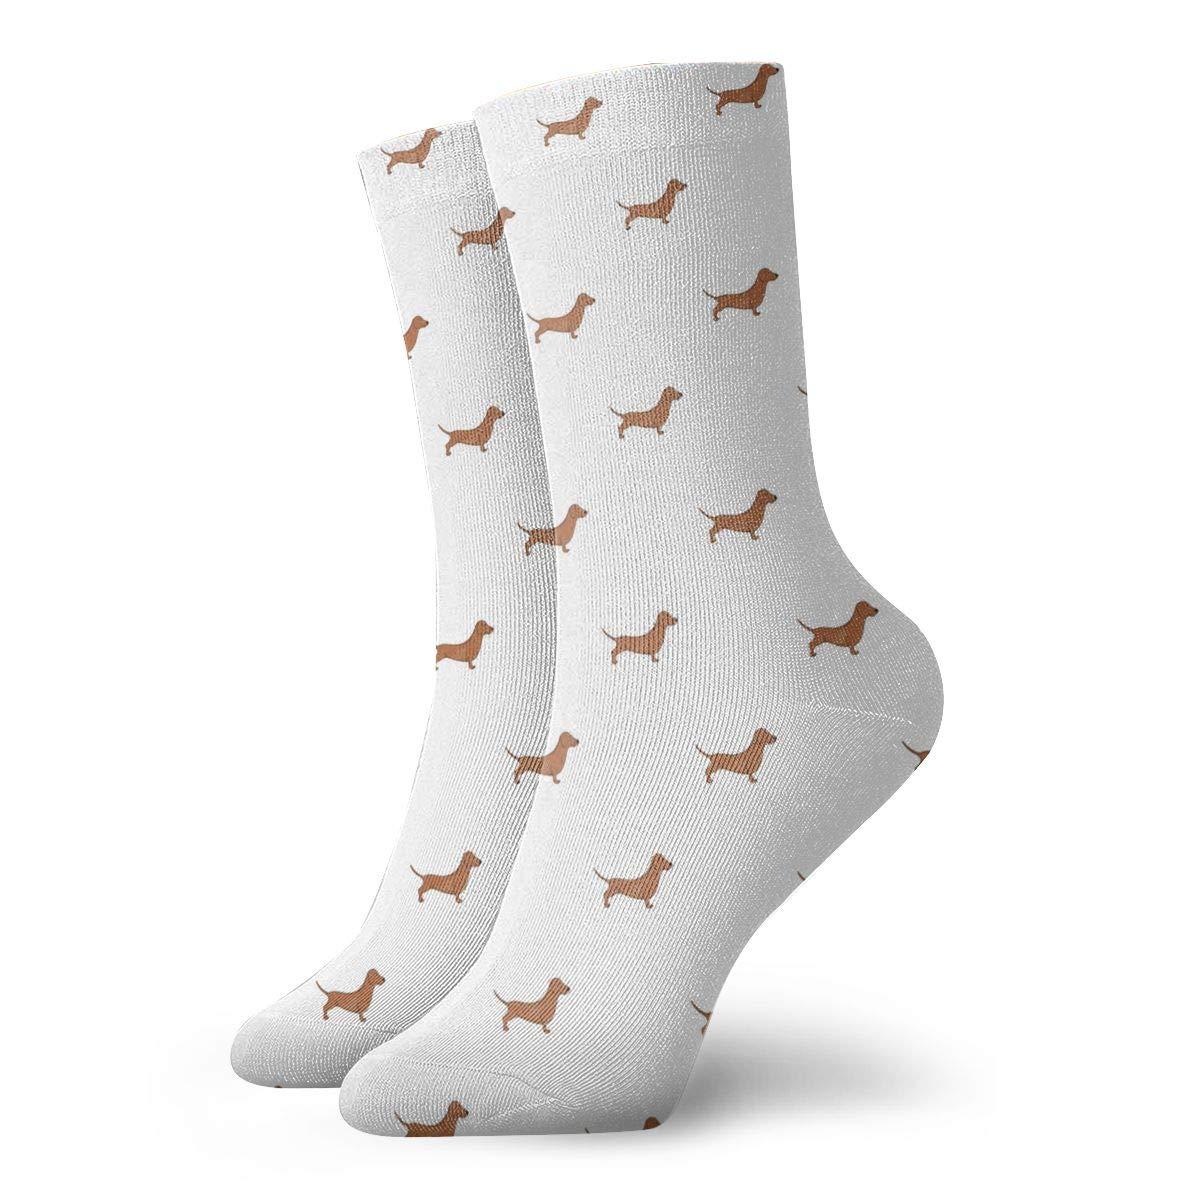 Unisex Baby Brown Dachshund Dog Athletic Quarter Ankle Print Breathable Hiking Running Socks